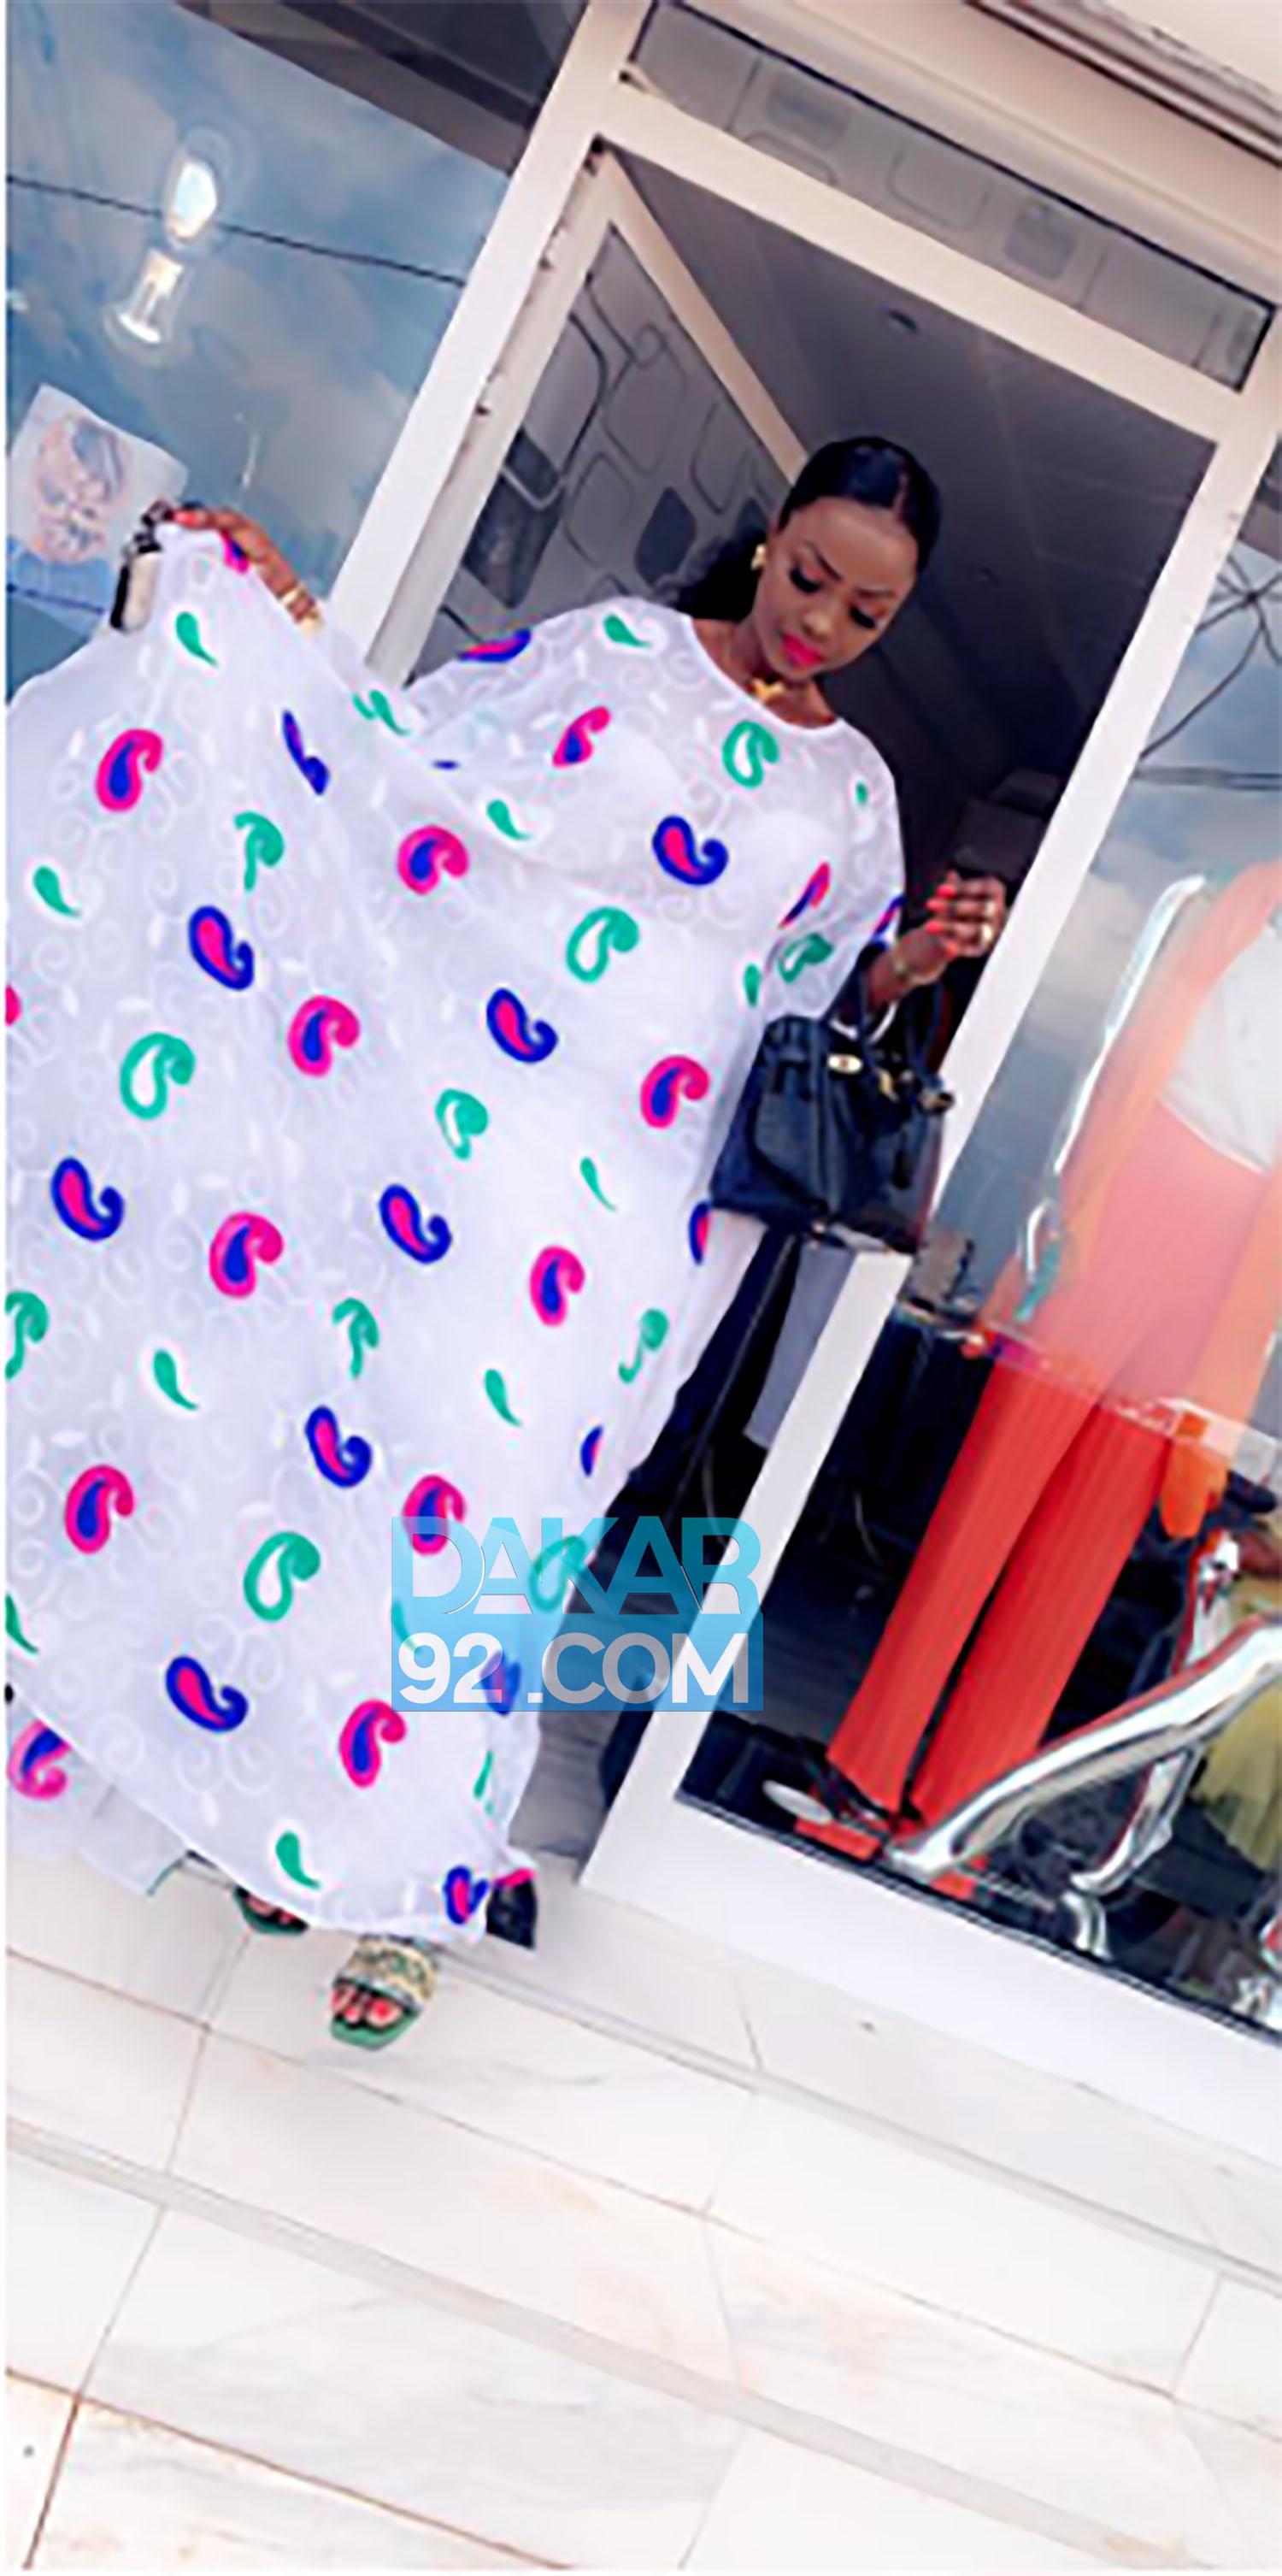 Sagnsé Tamkharite Mbathio Ndiaye Dévoile Toute Sa Classe5